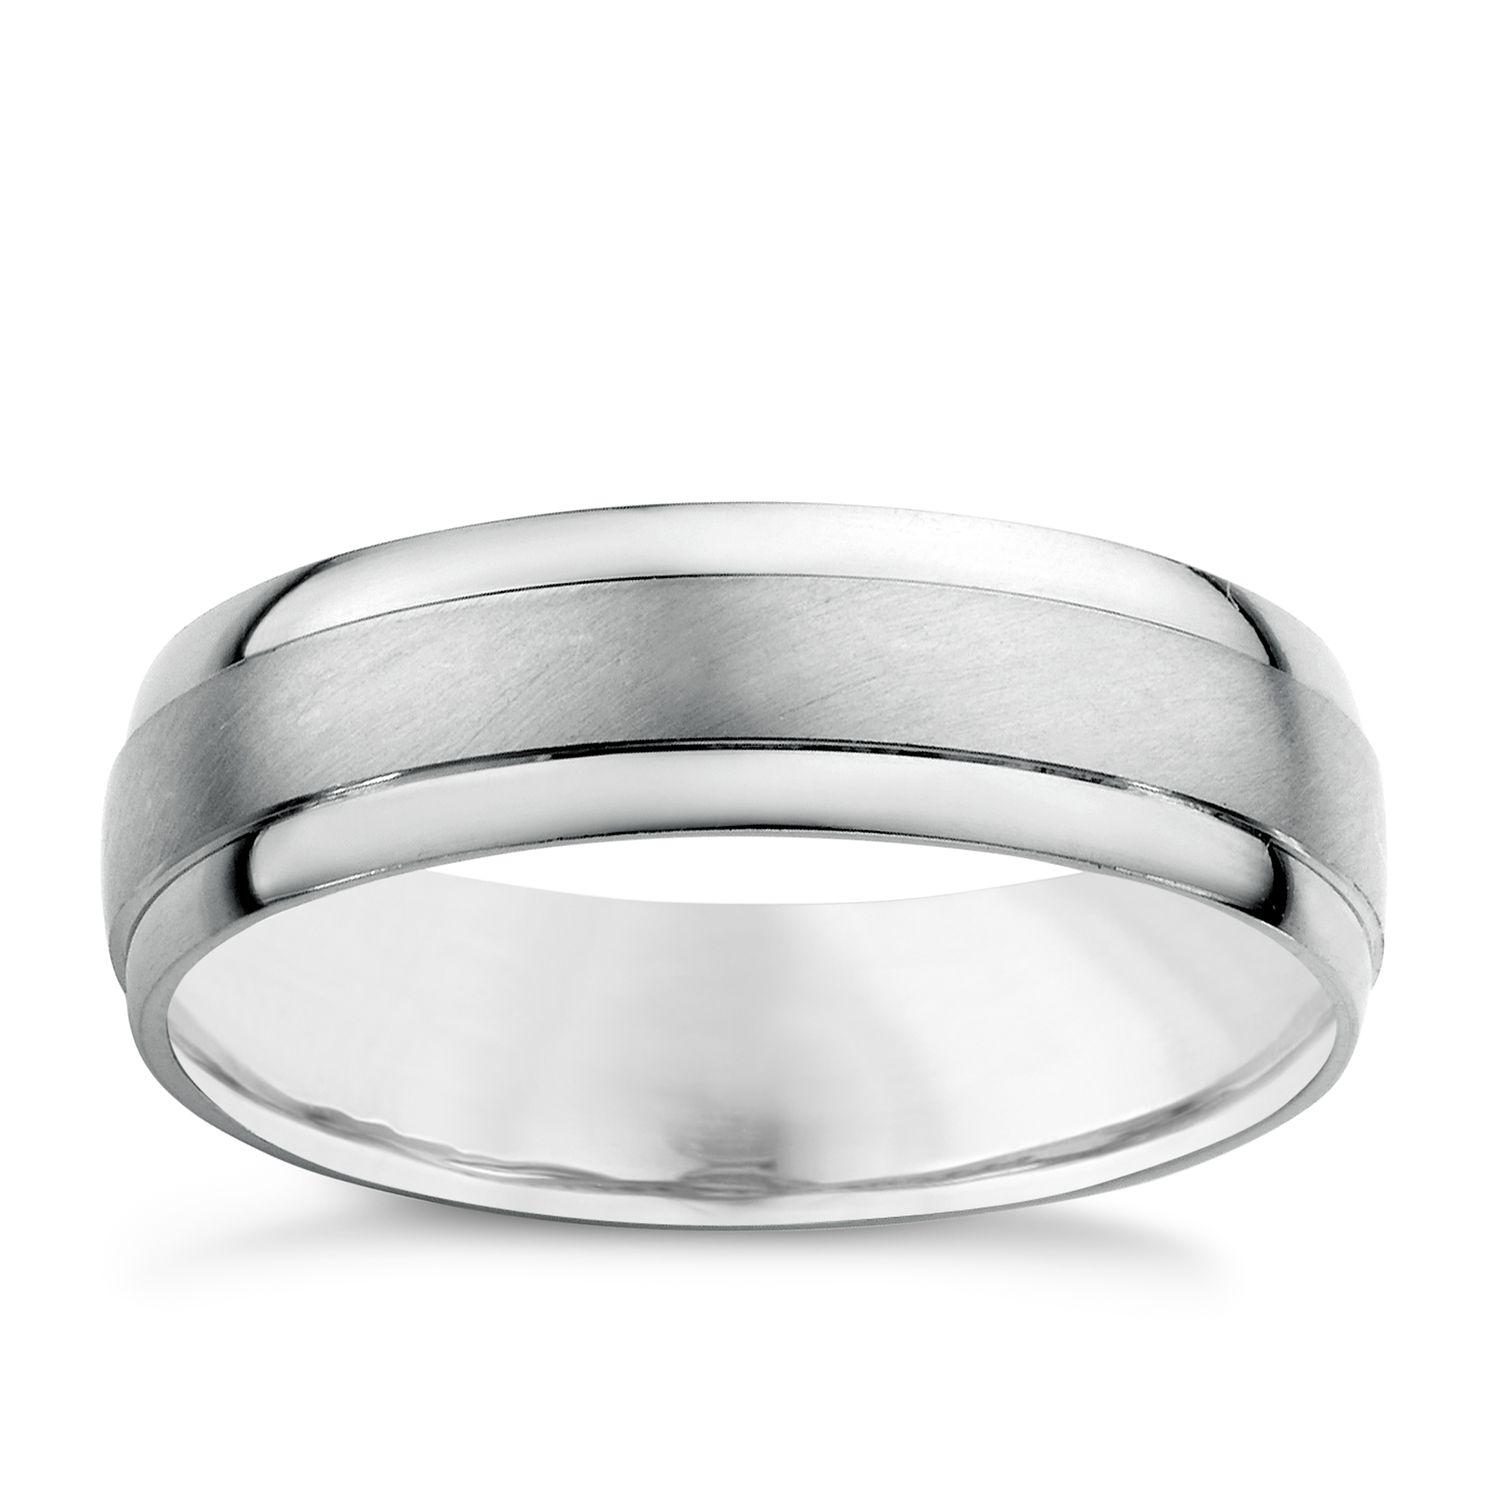 Wedding platinum rings hmuel platinum mens mattpolished wedding ring product number 5353130 junglespirit Choice Image